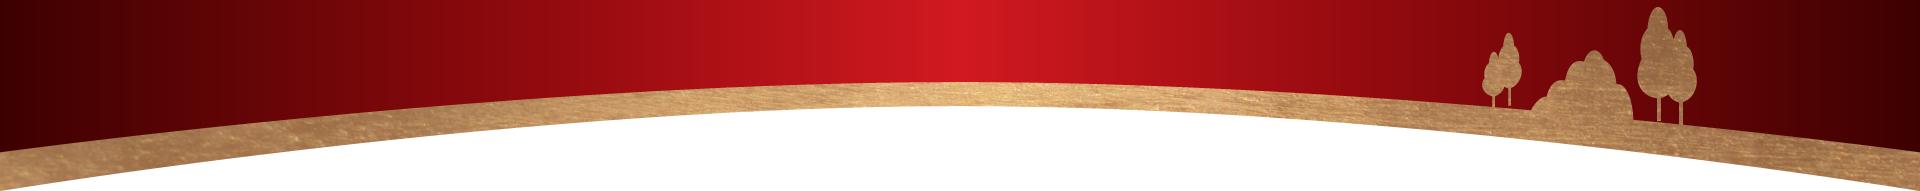 red-hill-gradient-bottom-opaq